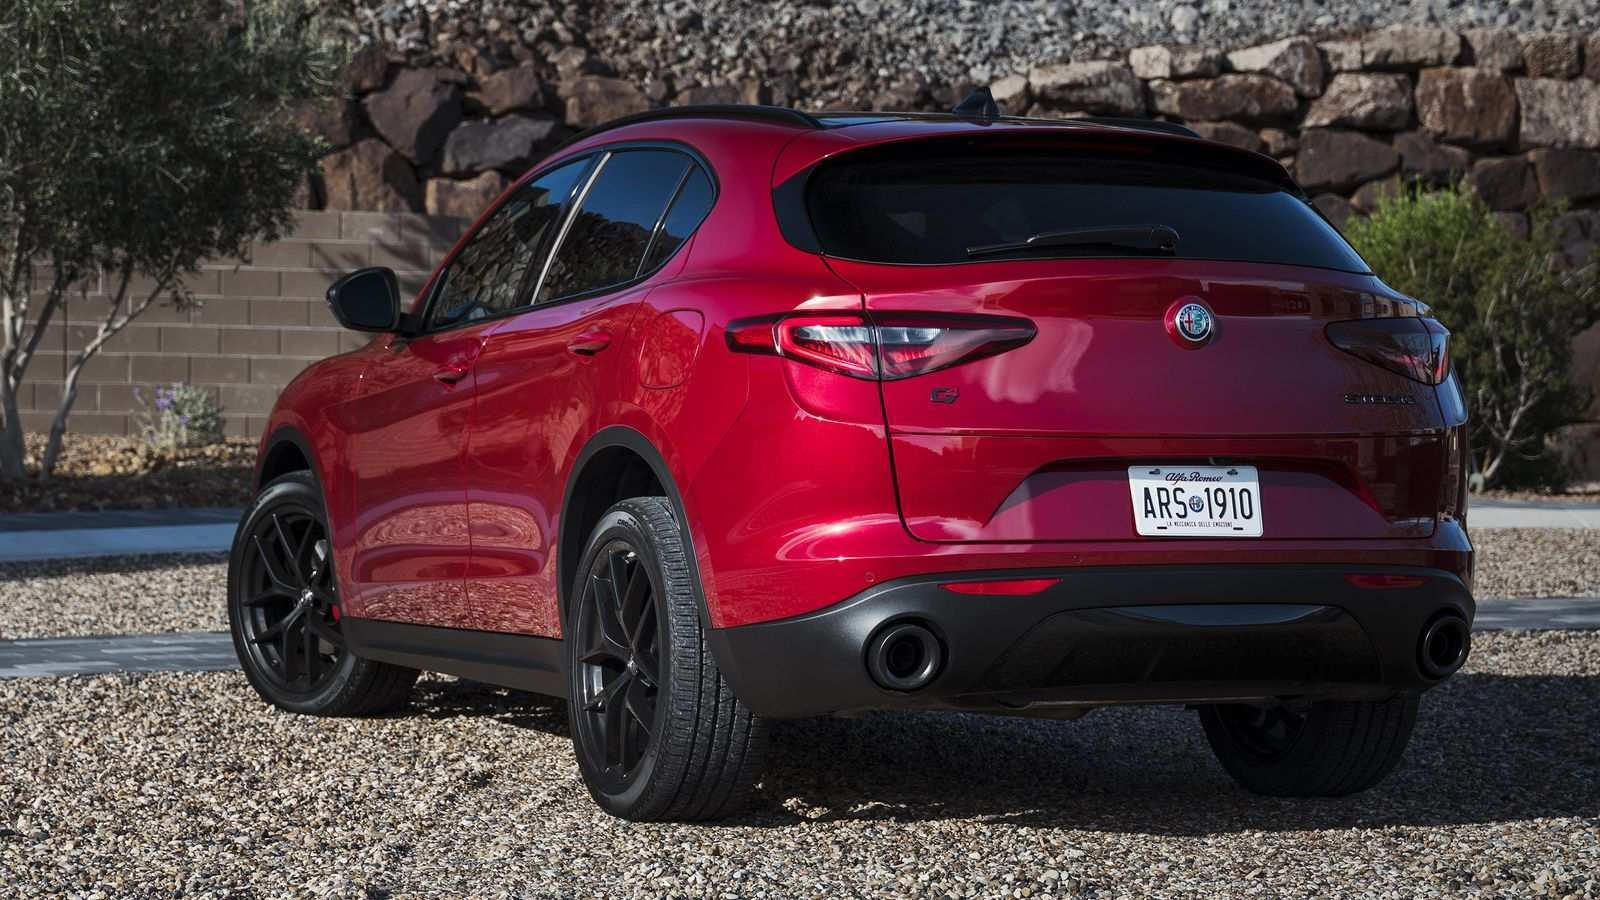 38 Great 2019 Alfa Romeo Stelvio Release Date Exterior and Interior with 2019 Alfa Romeo Stelvio Release Date